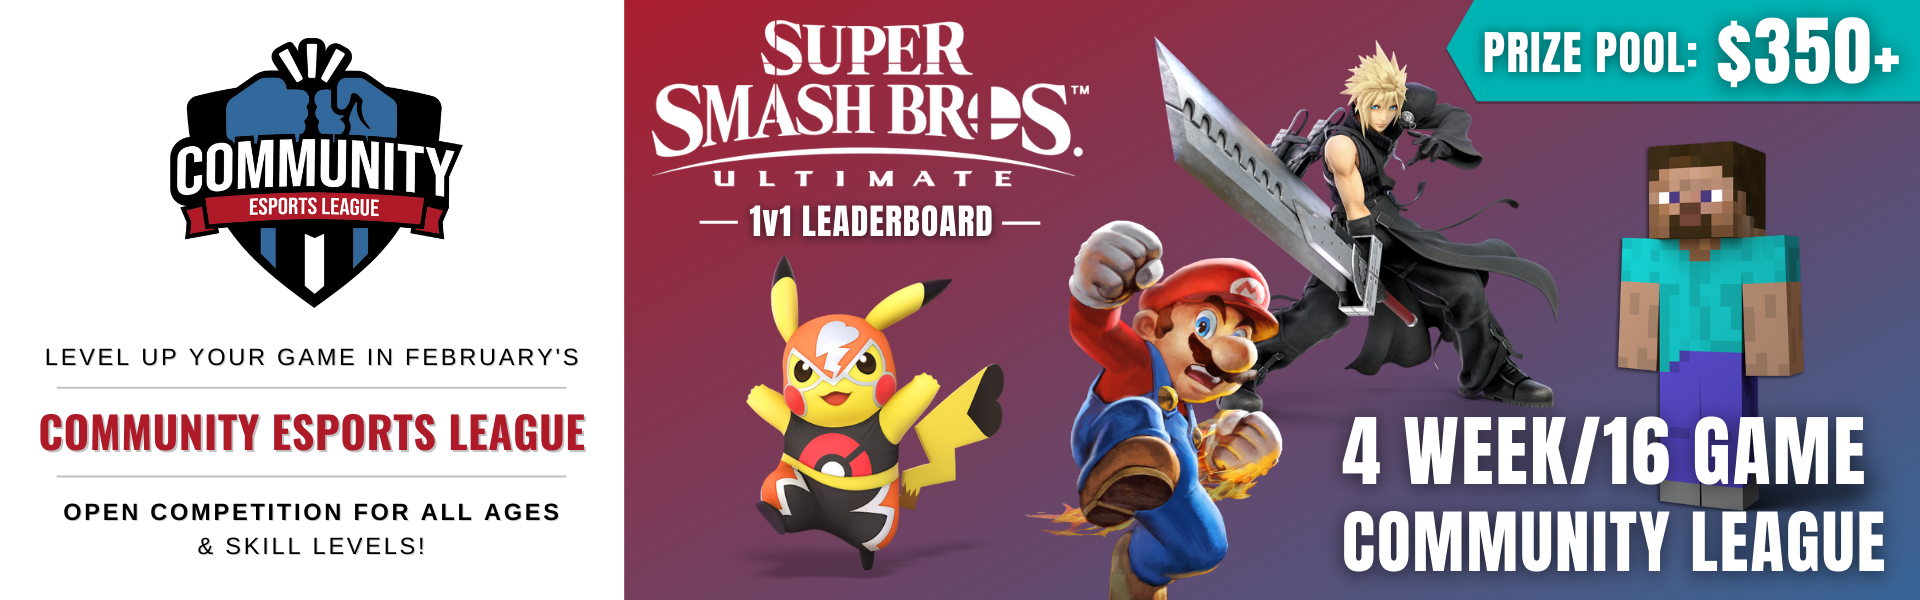 Super Smash Bros. Ultimate: February 21